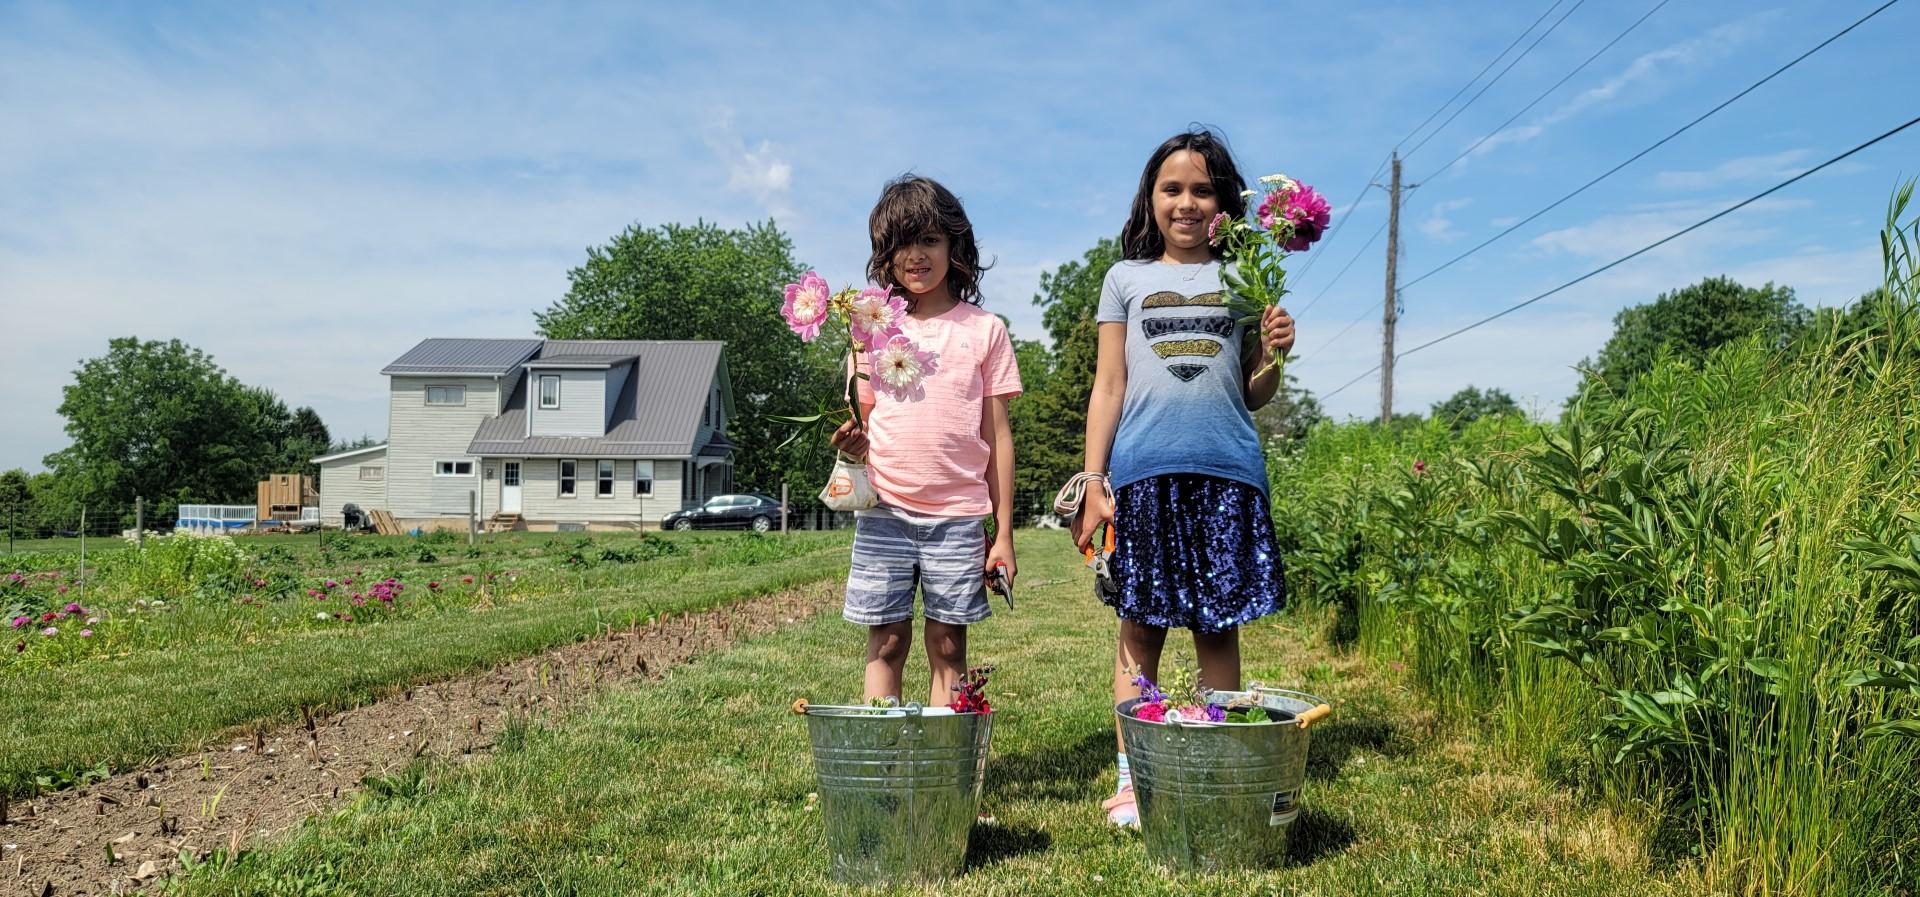 Kids holding flowers